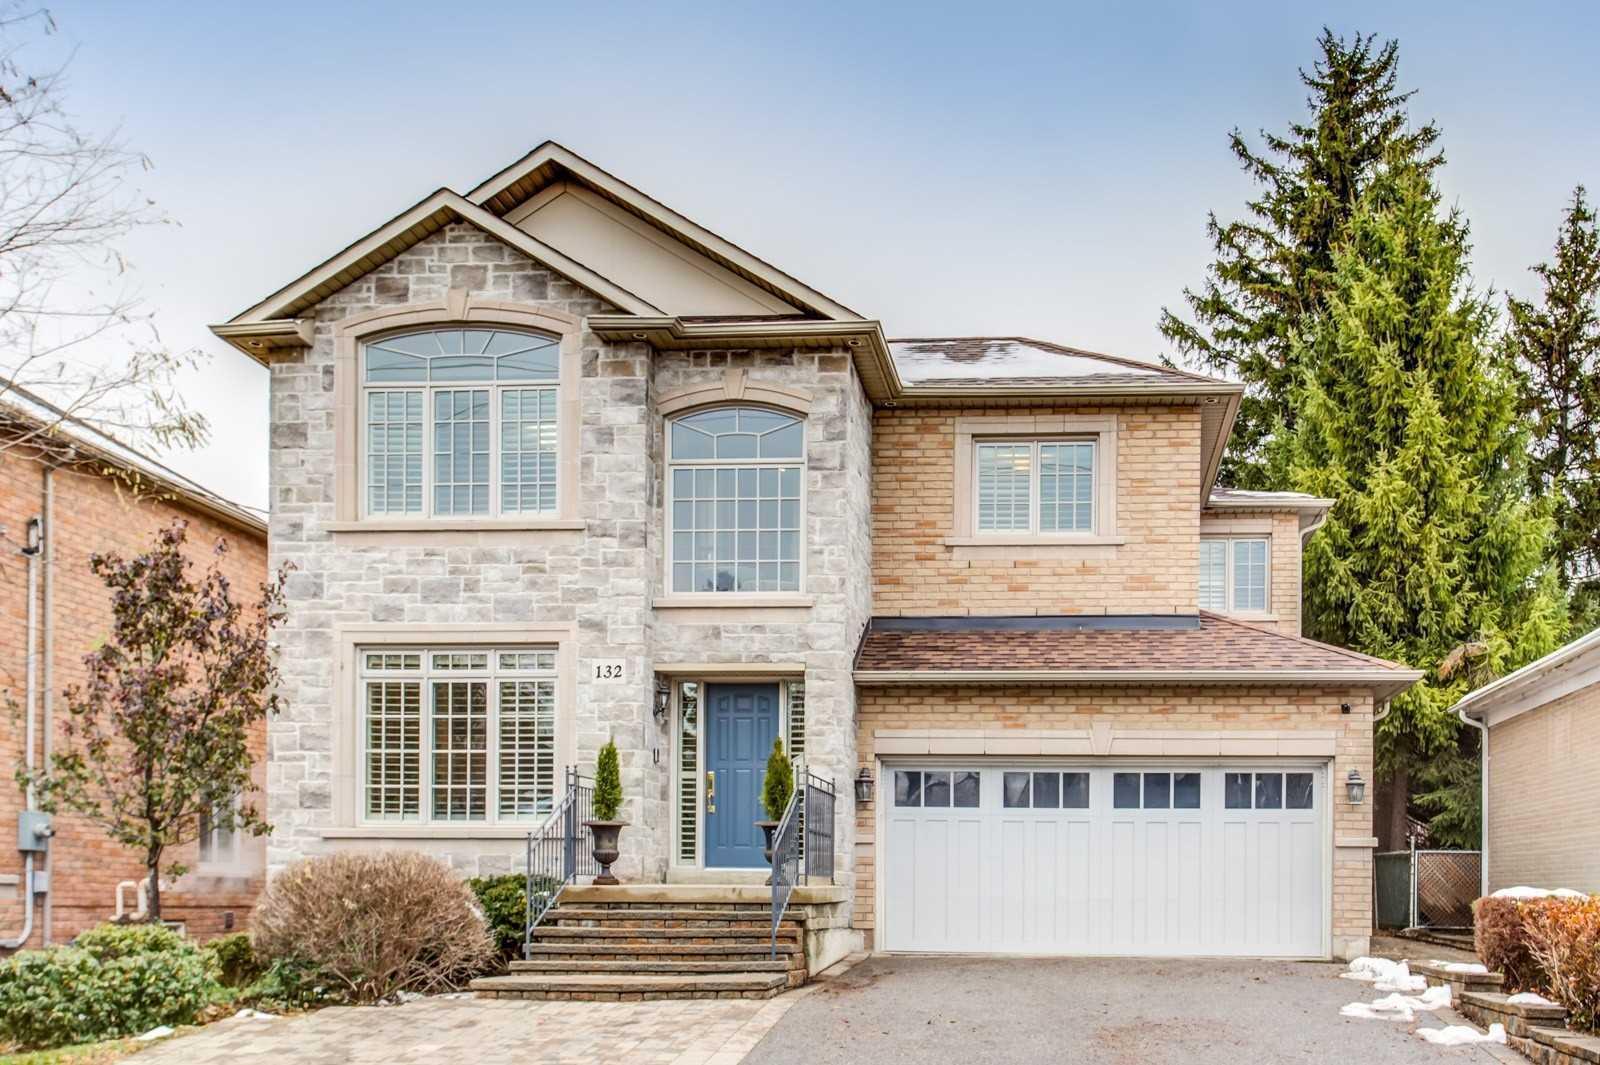 132 York Mills Rd, Toronto C4638342